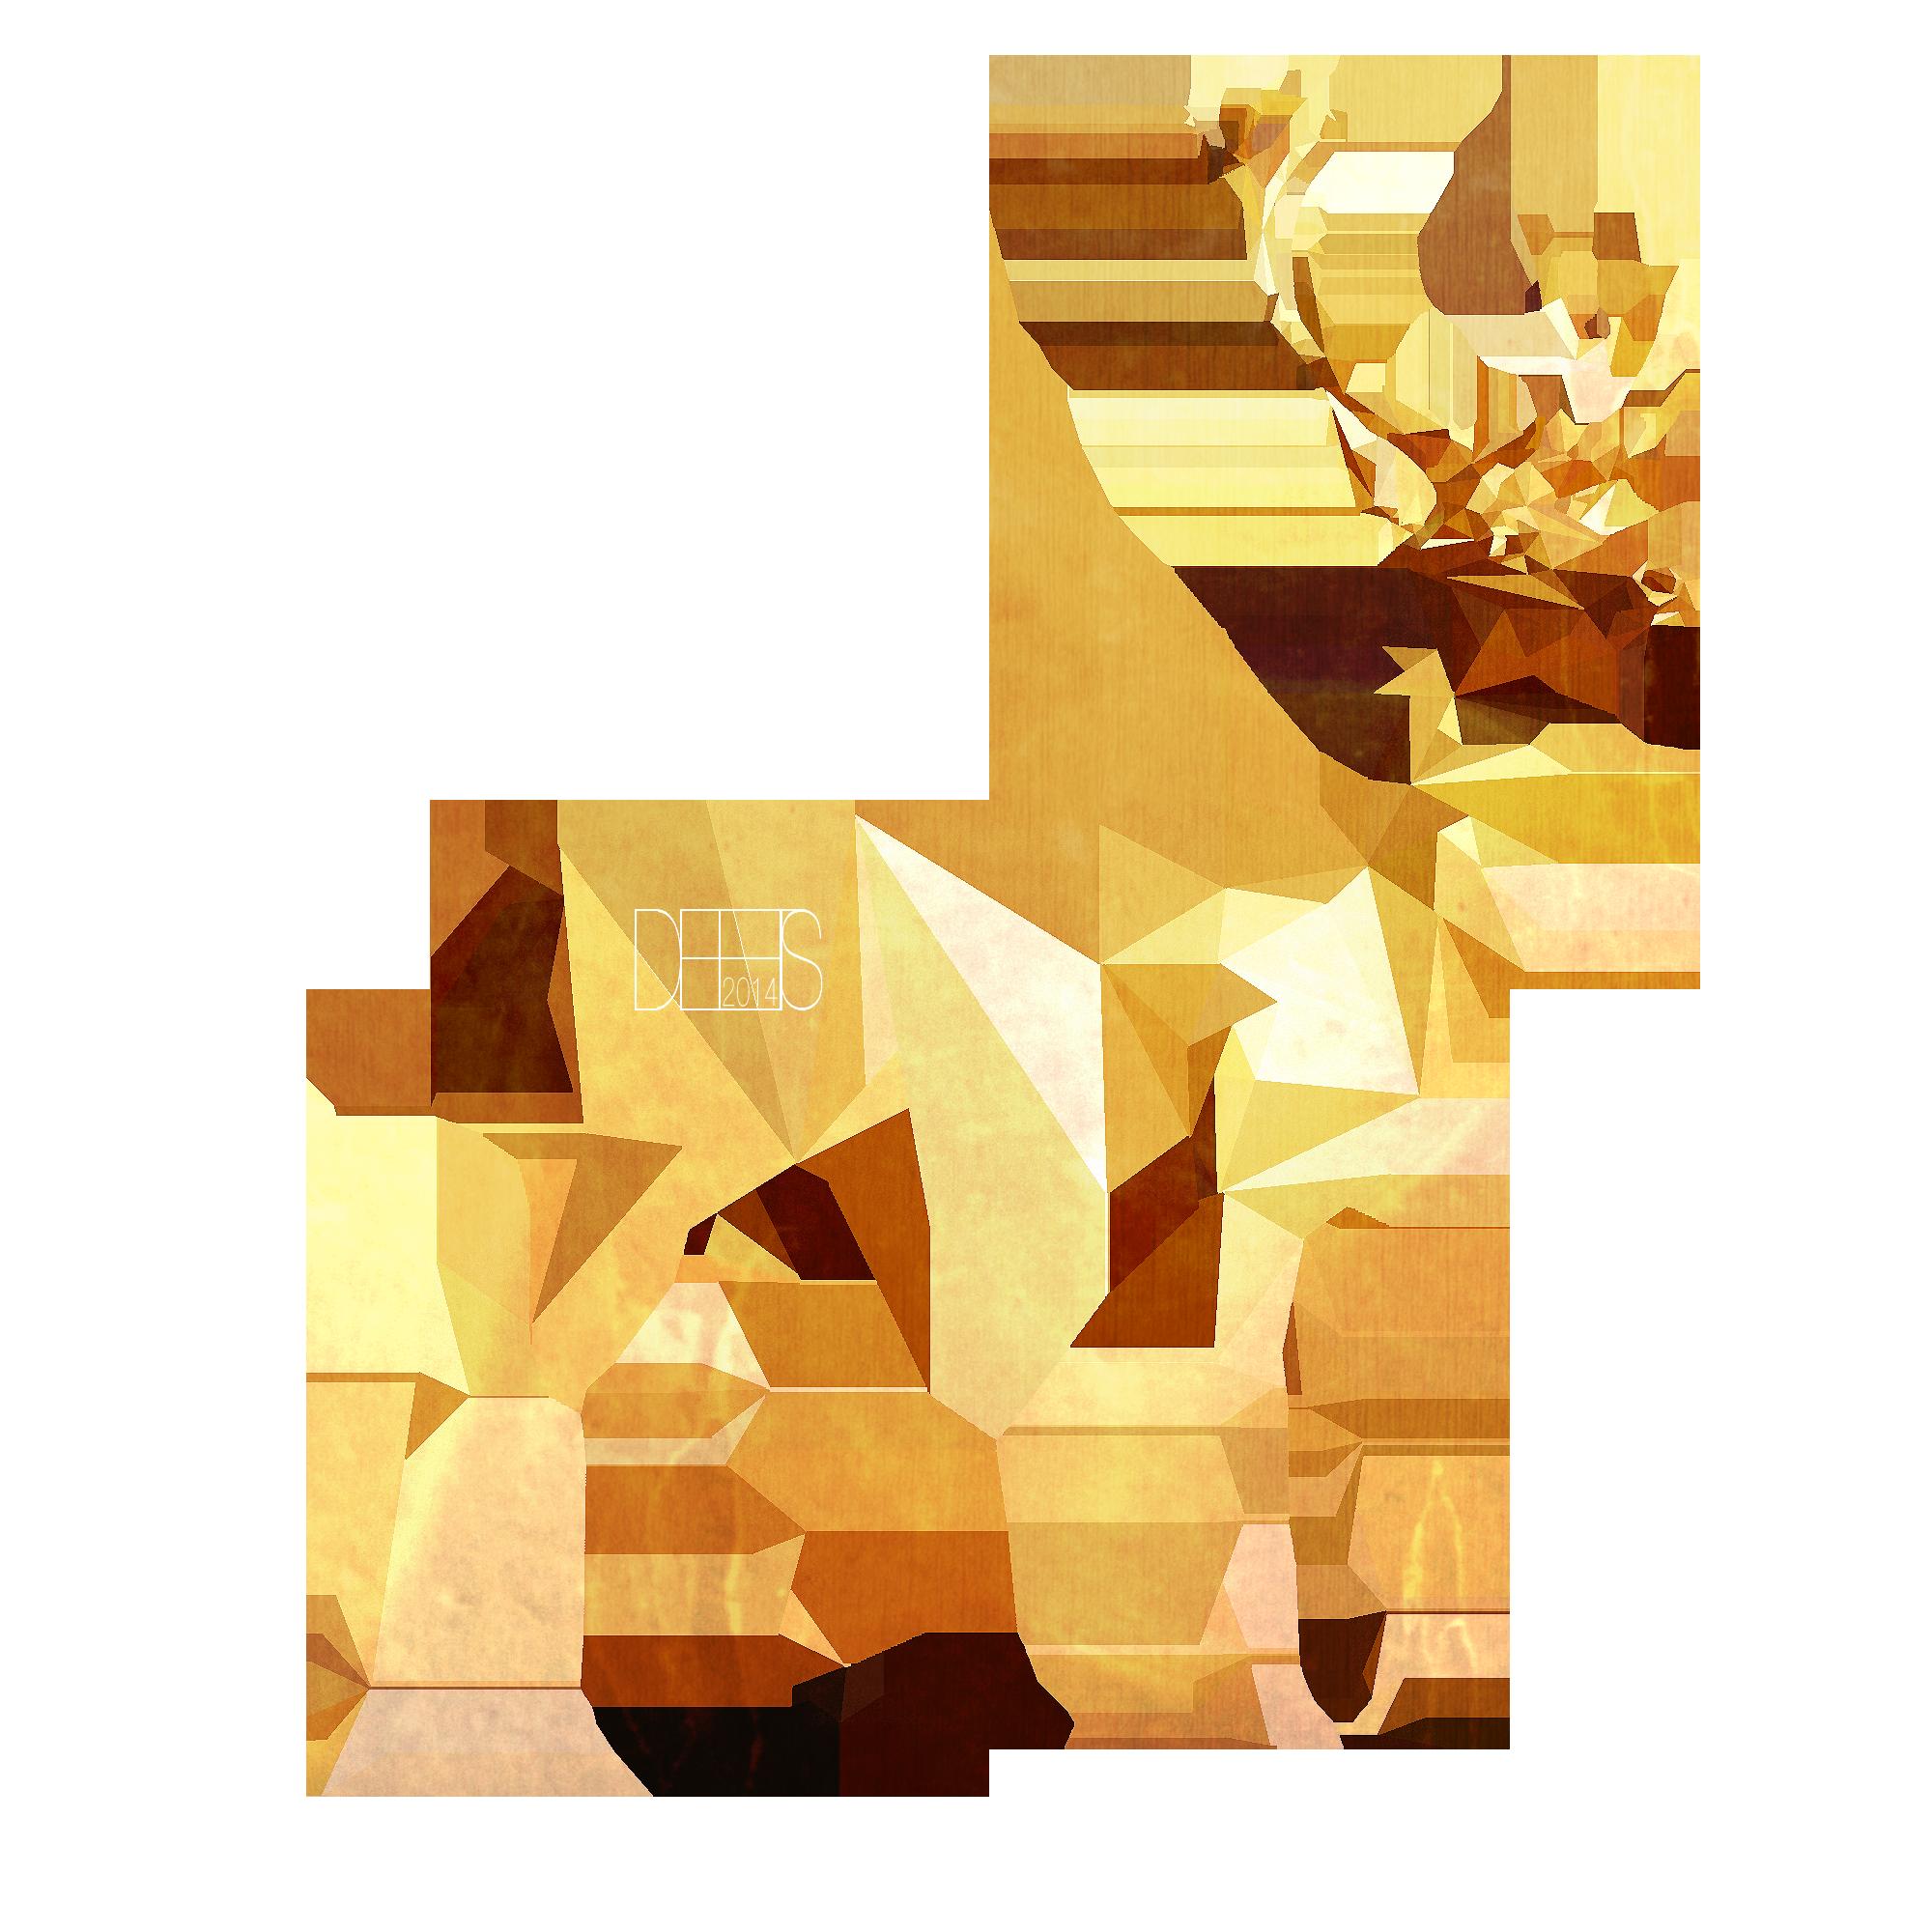 Image Deets Low Poly Deer Png Animal Jam Clans Wiki